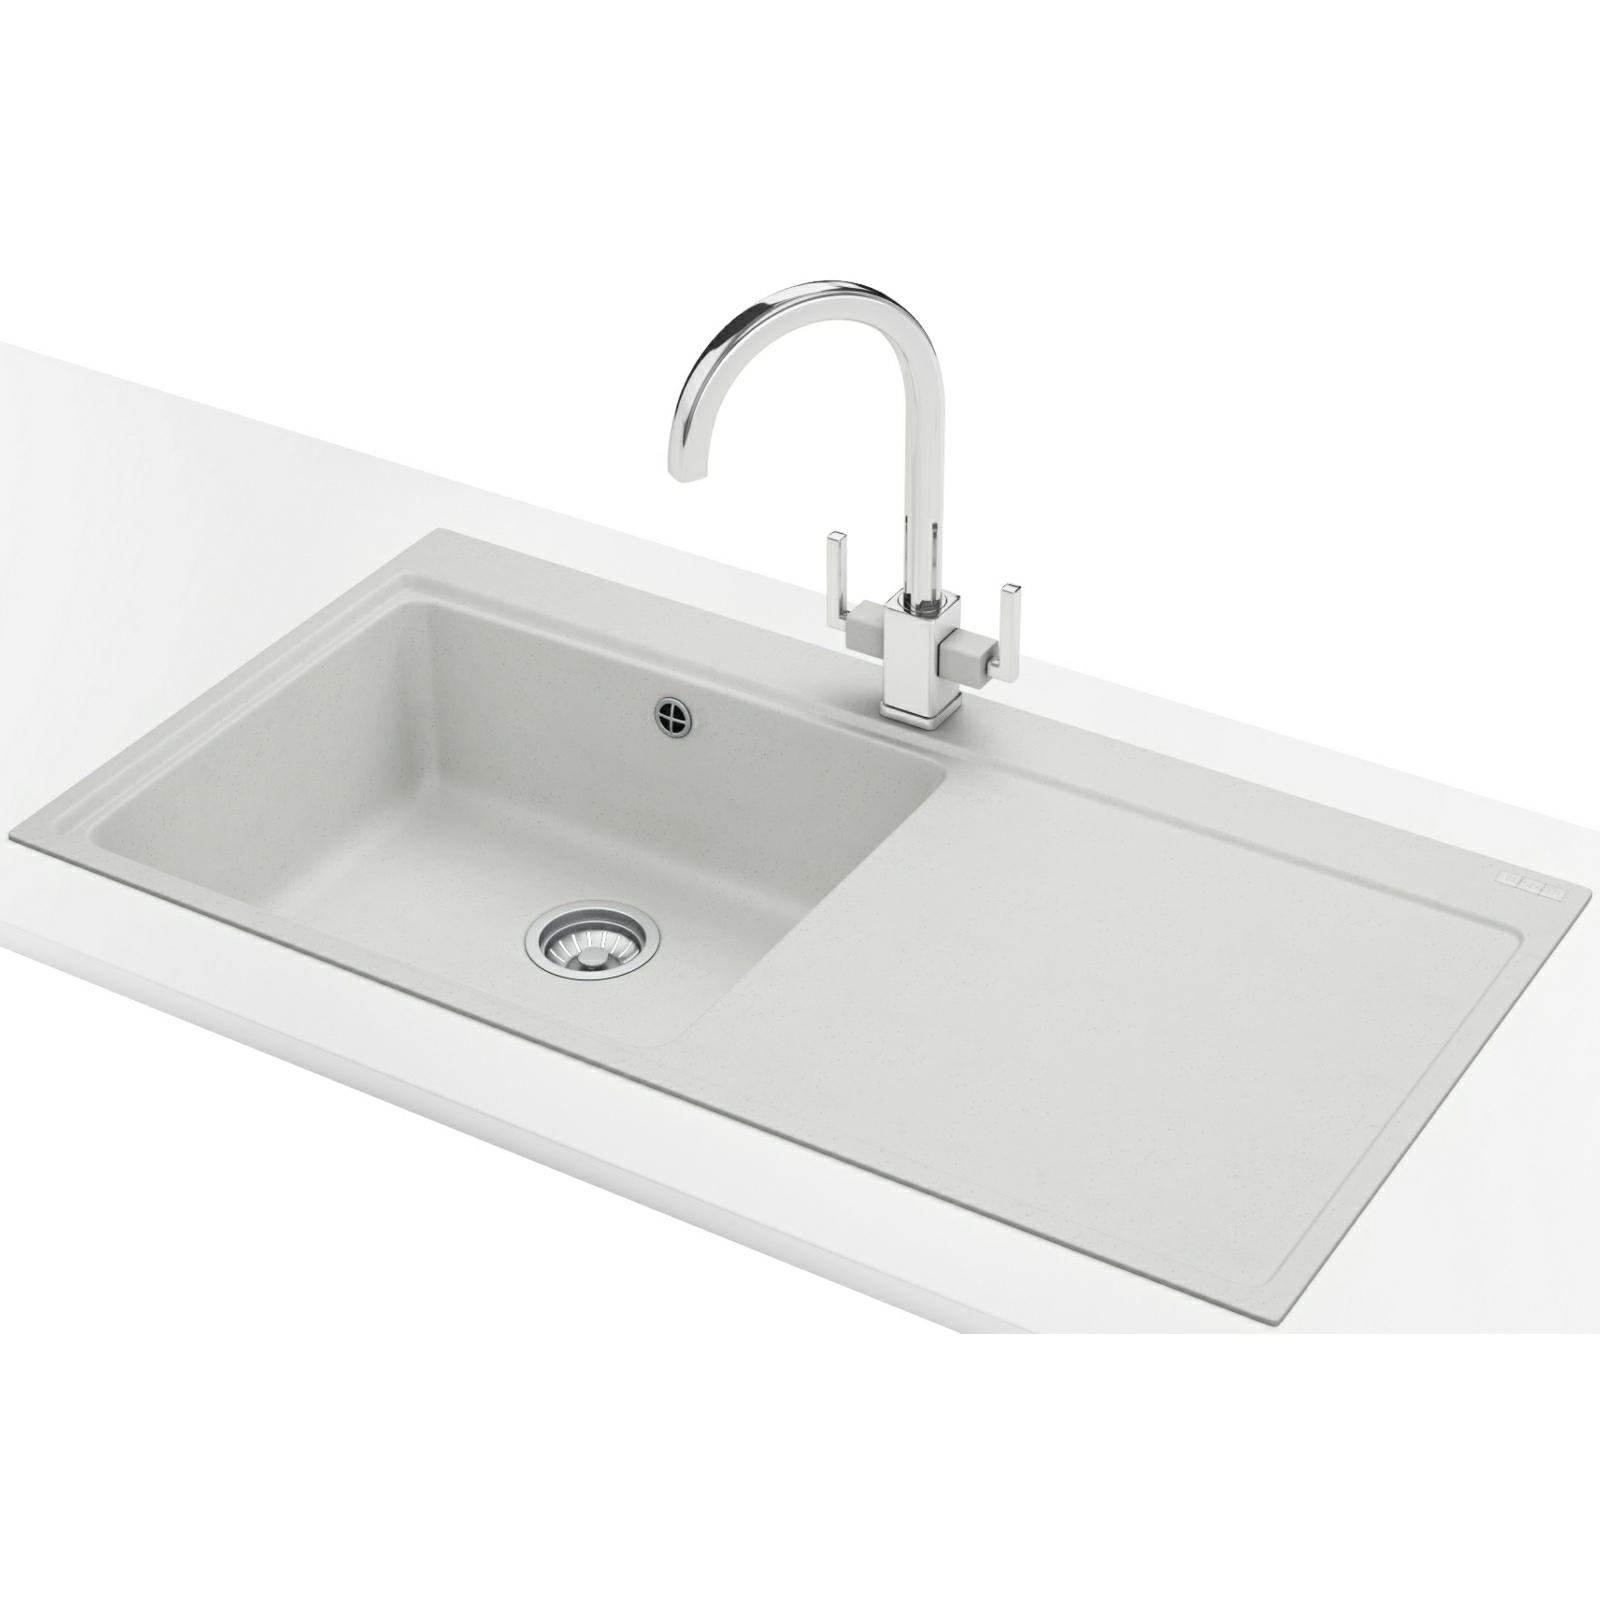 Franke Mythos Sink And Tap Pack : Franke Mythos MTG 611 DP-Fragranite White Right Drainer Sink And Tap